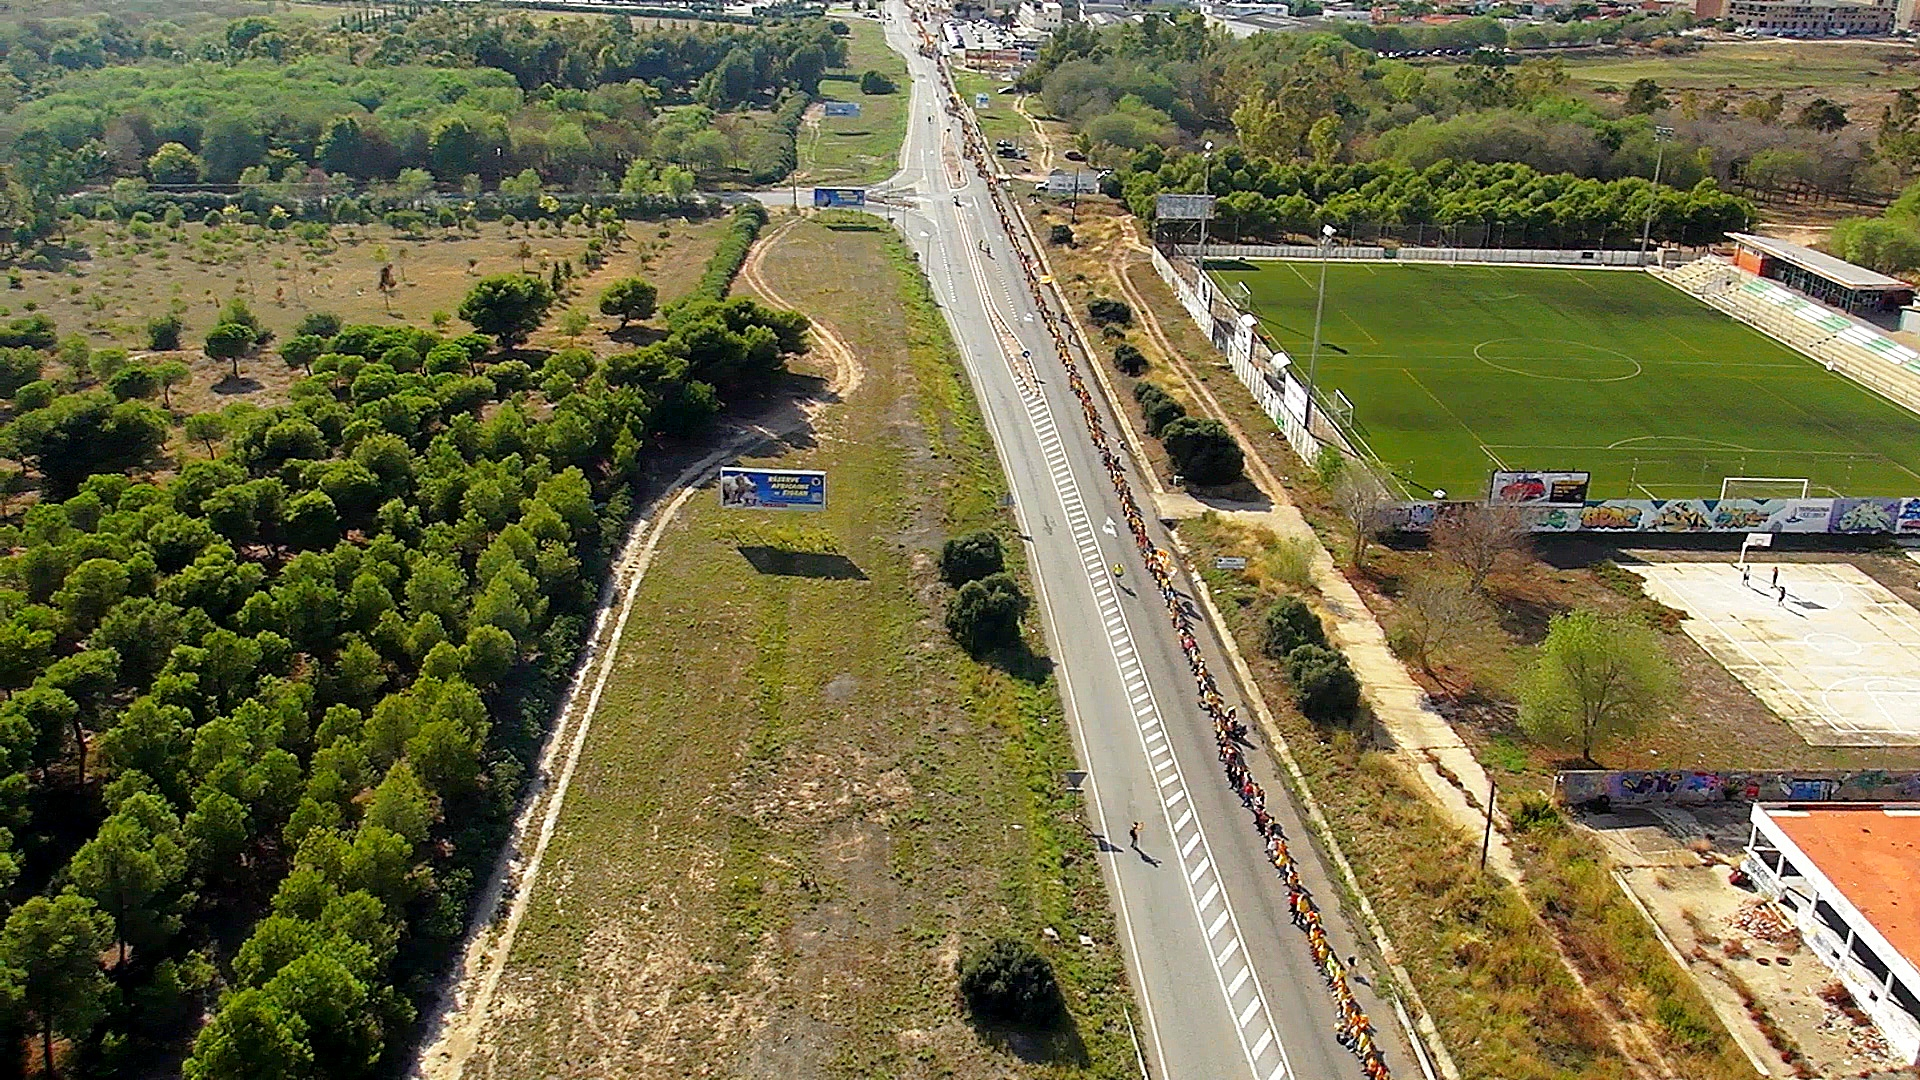 Foto aerea via catalana 2